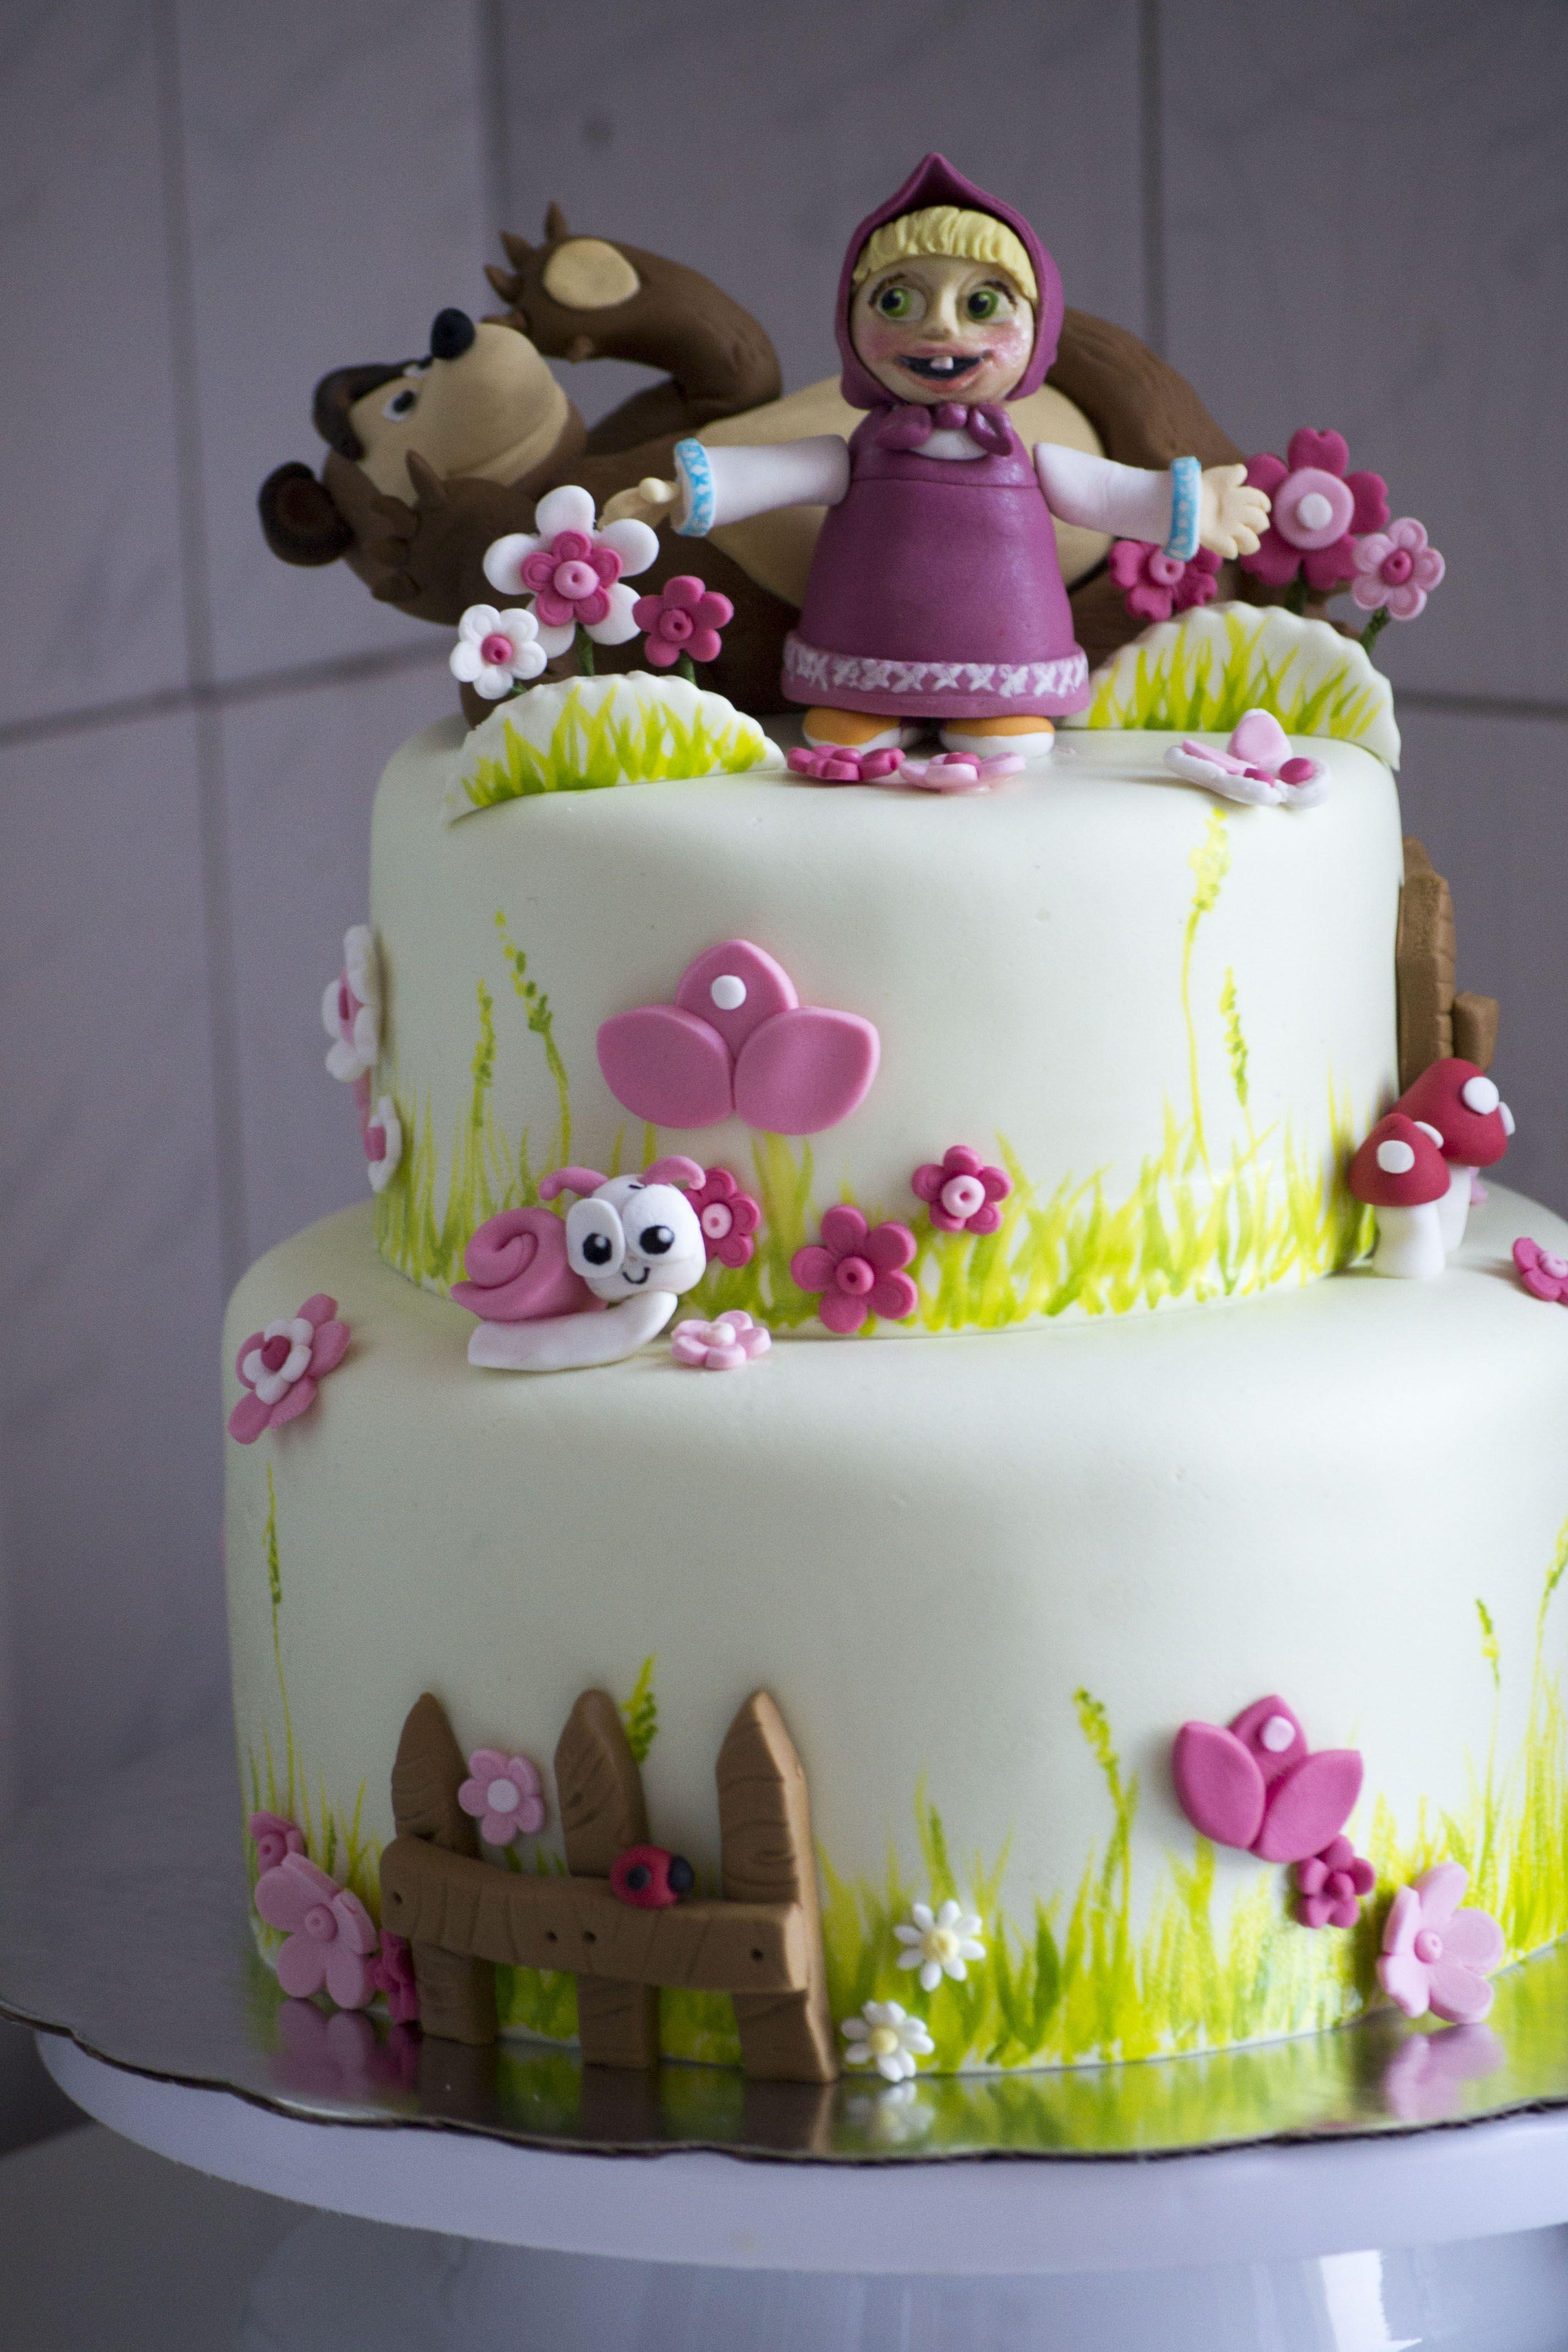 Masha And The Bear Birthday Cake Visit My Facebook Page At Https - Bear birthday cake